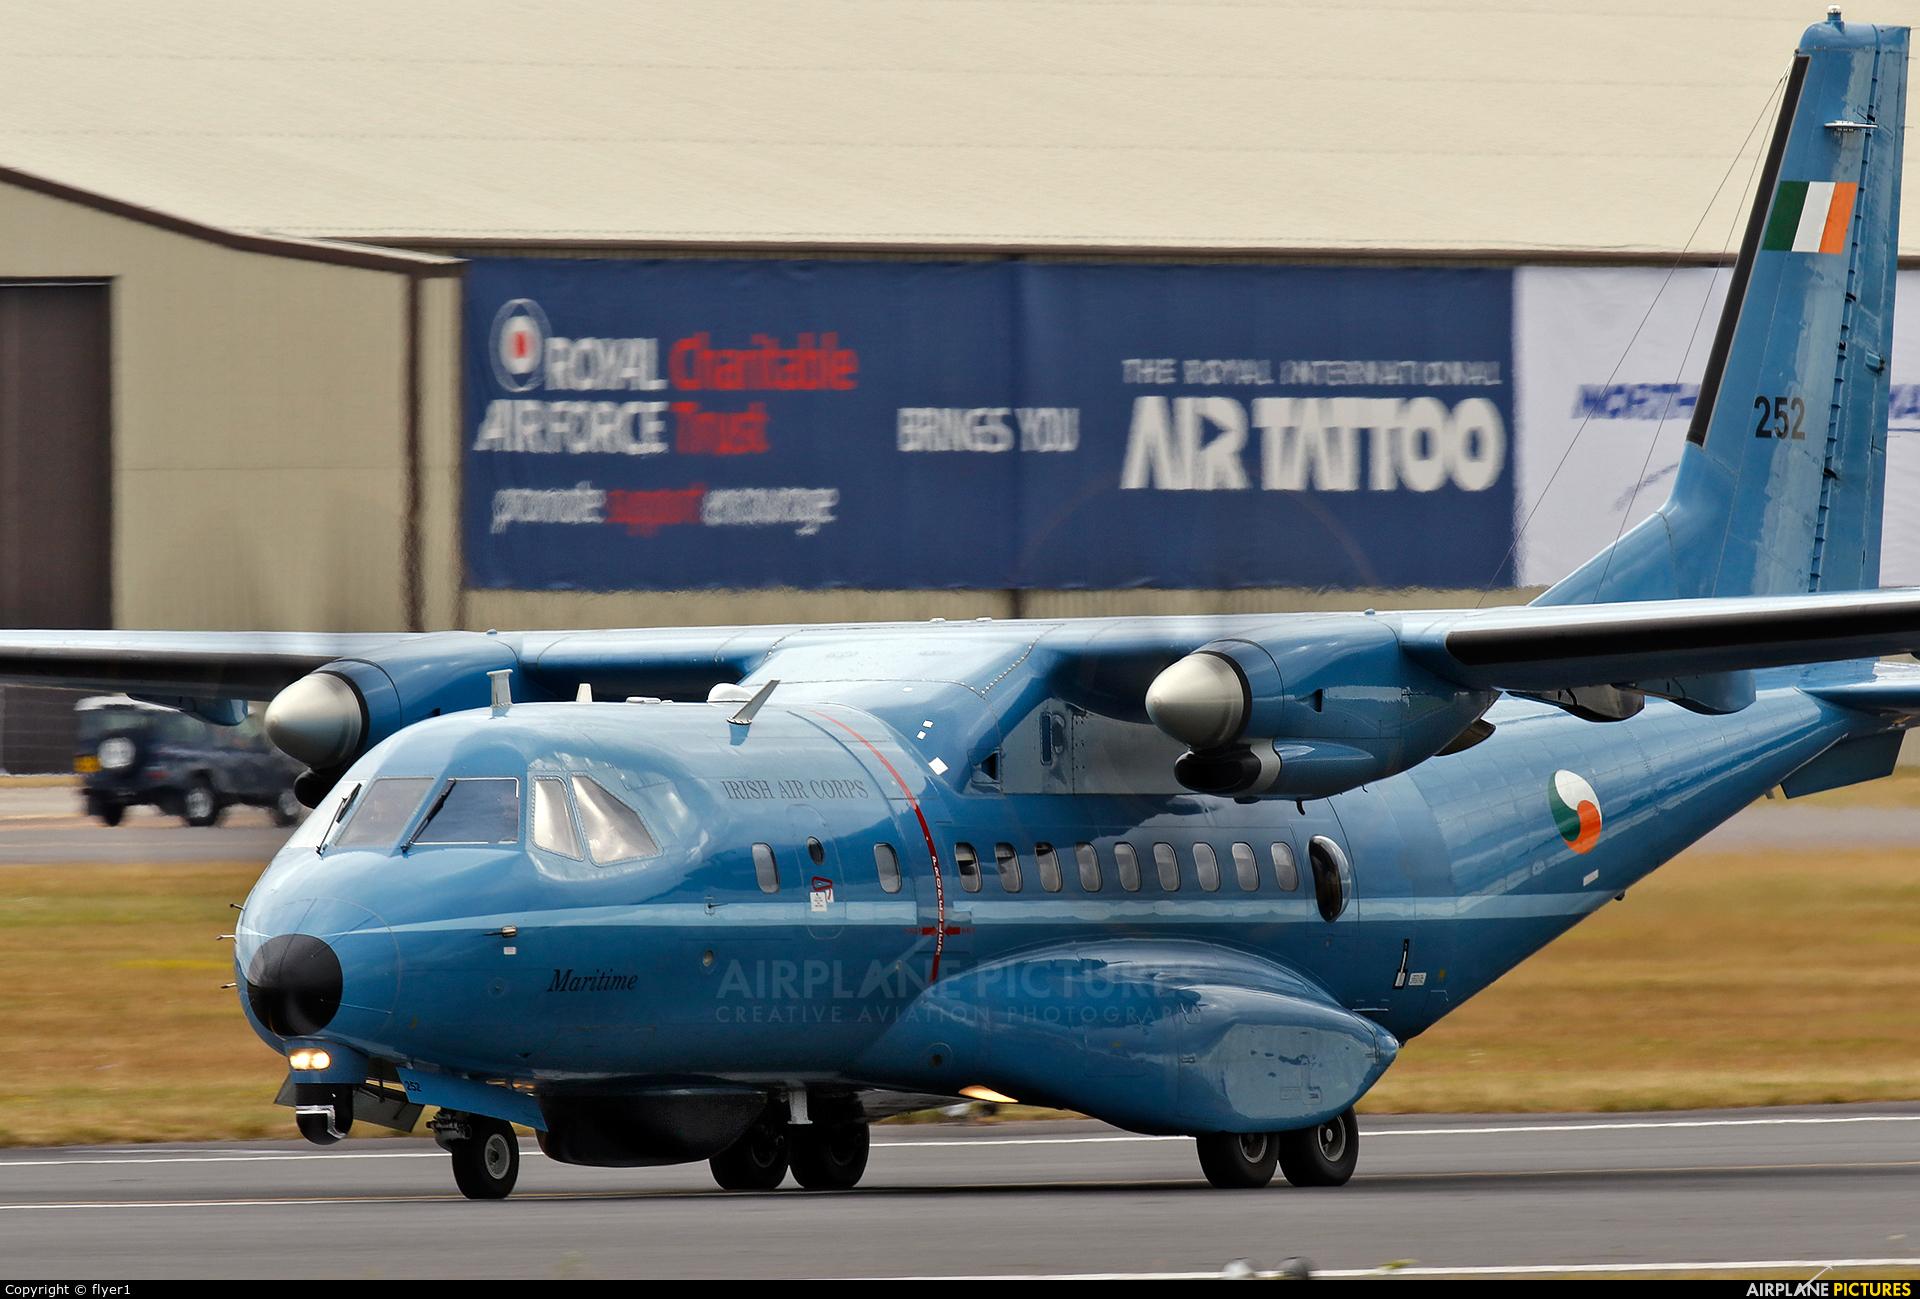 Ireland - Air Corps 252 aircraft at Fairford